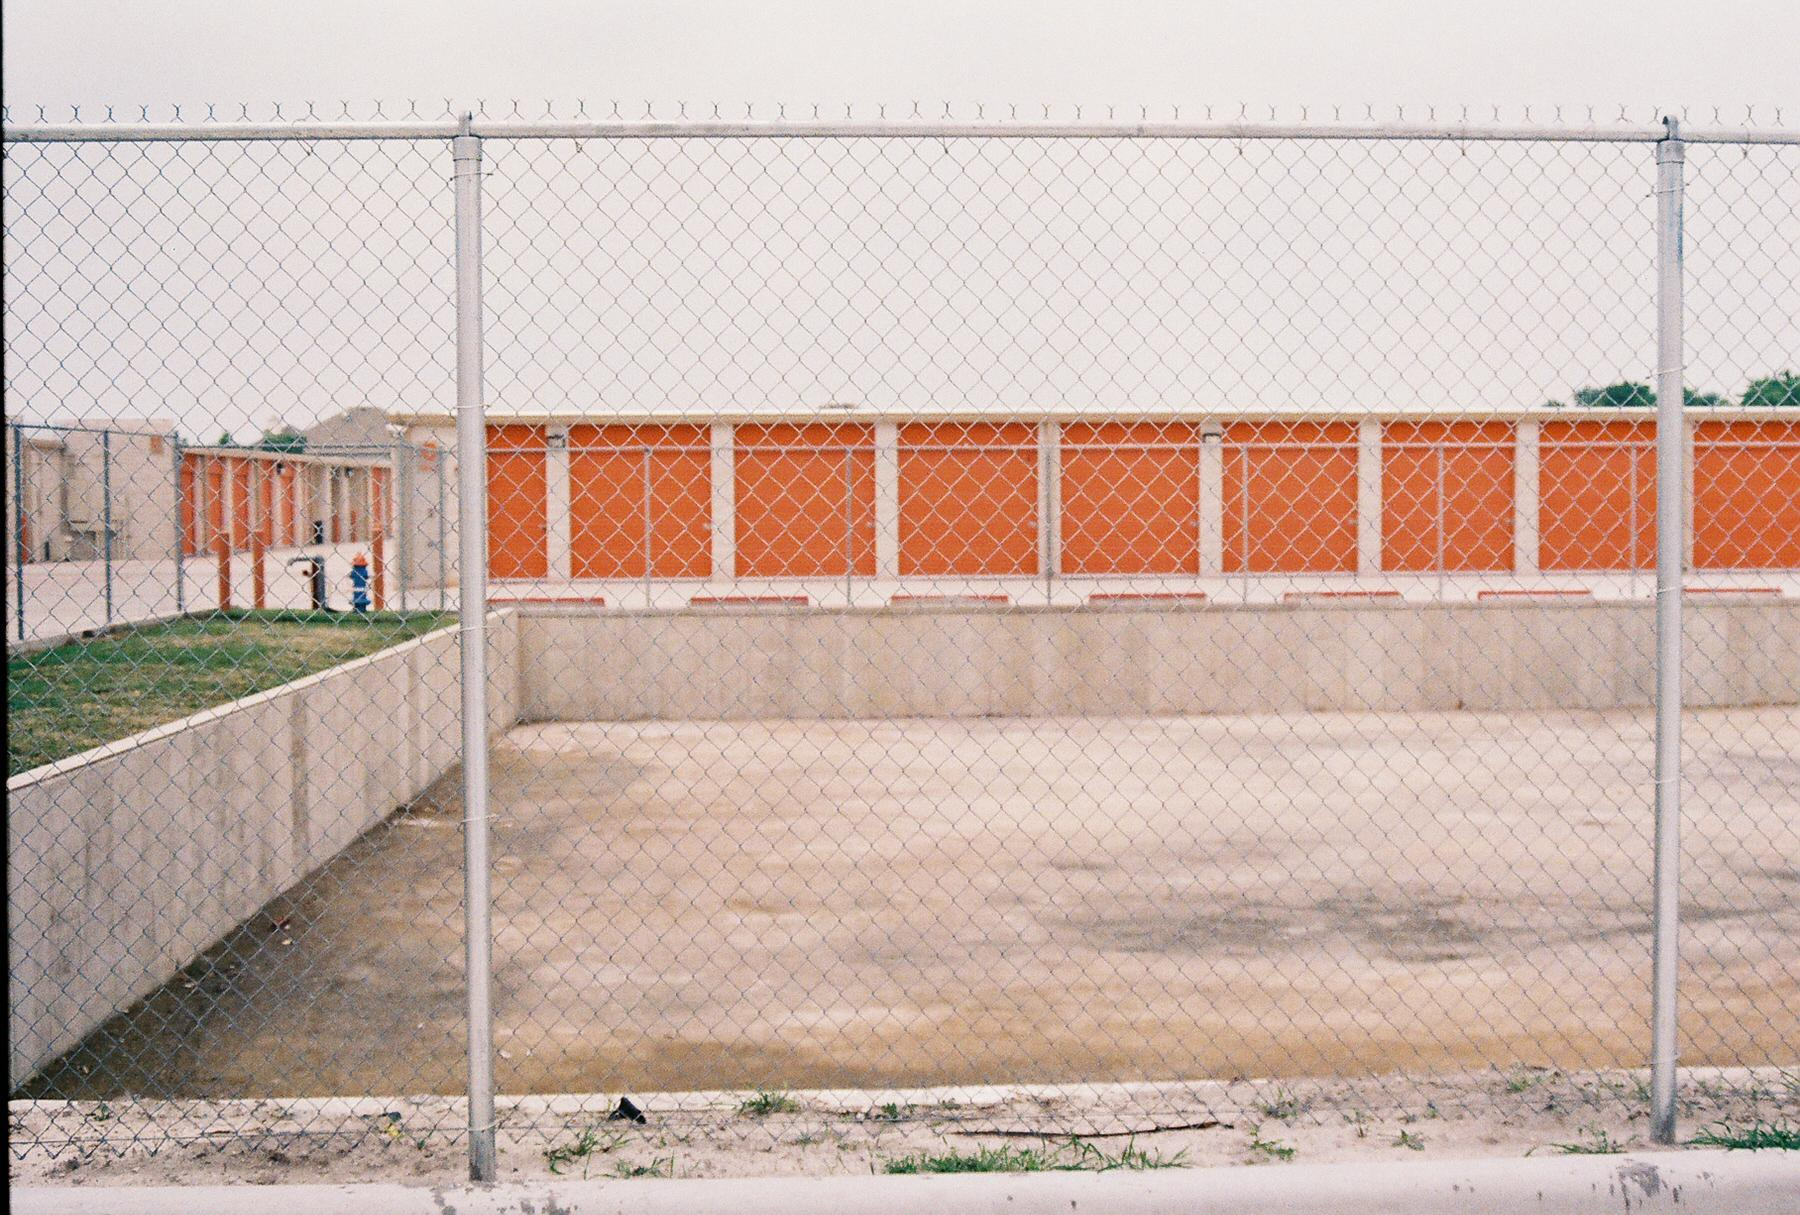 Tejas Fence & Iron Works, Inc image 3